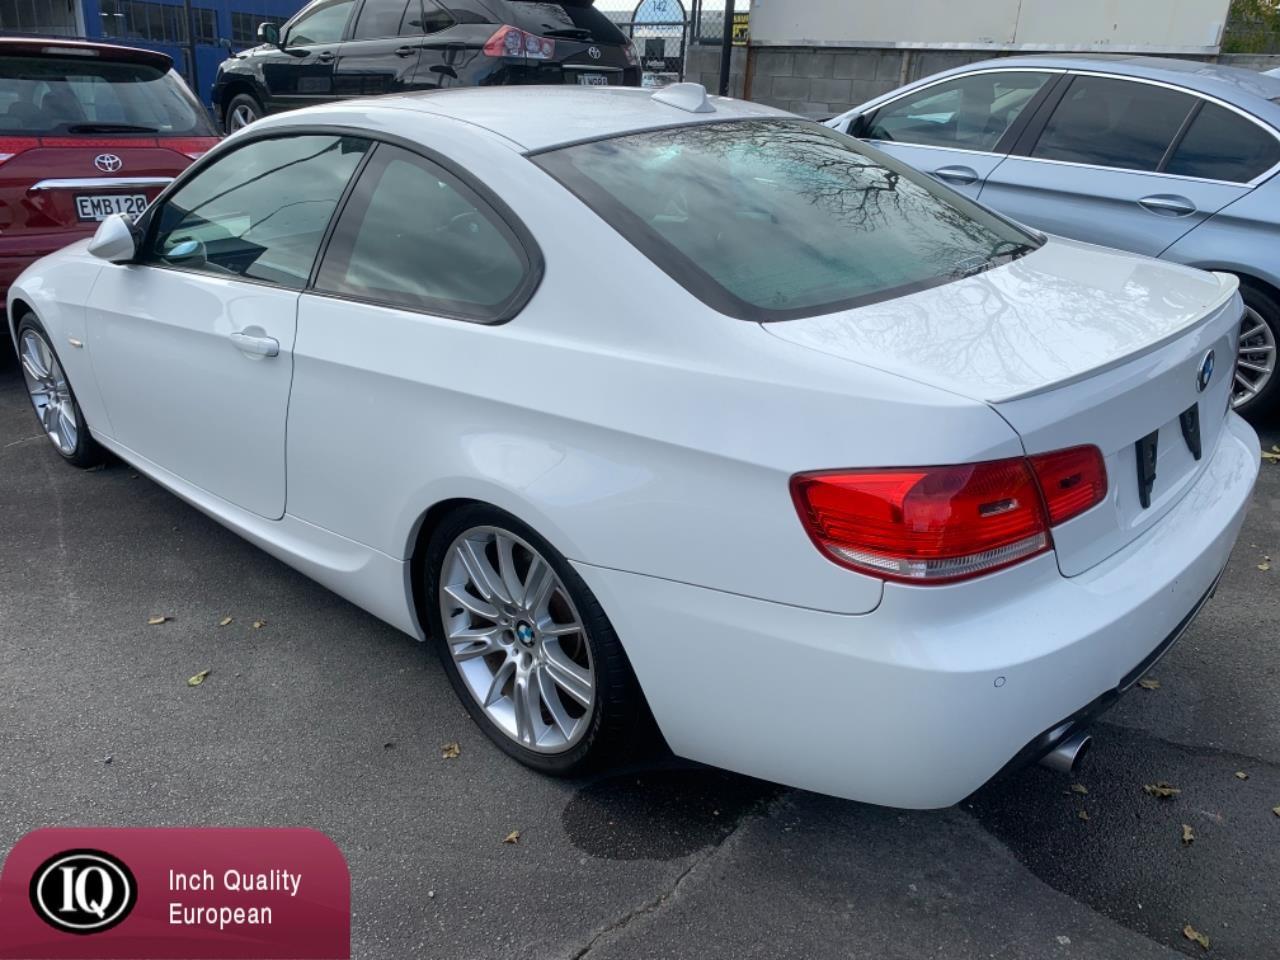 image-3, 2009 BMW 335i 3.0 Twin Turbo M Sport at Christchurch